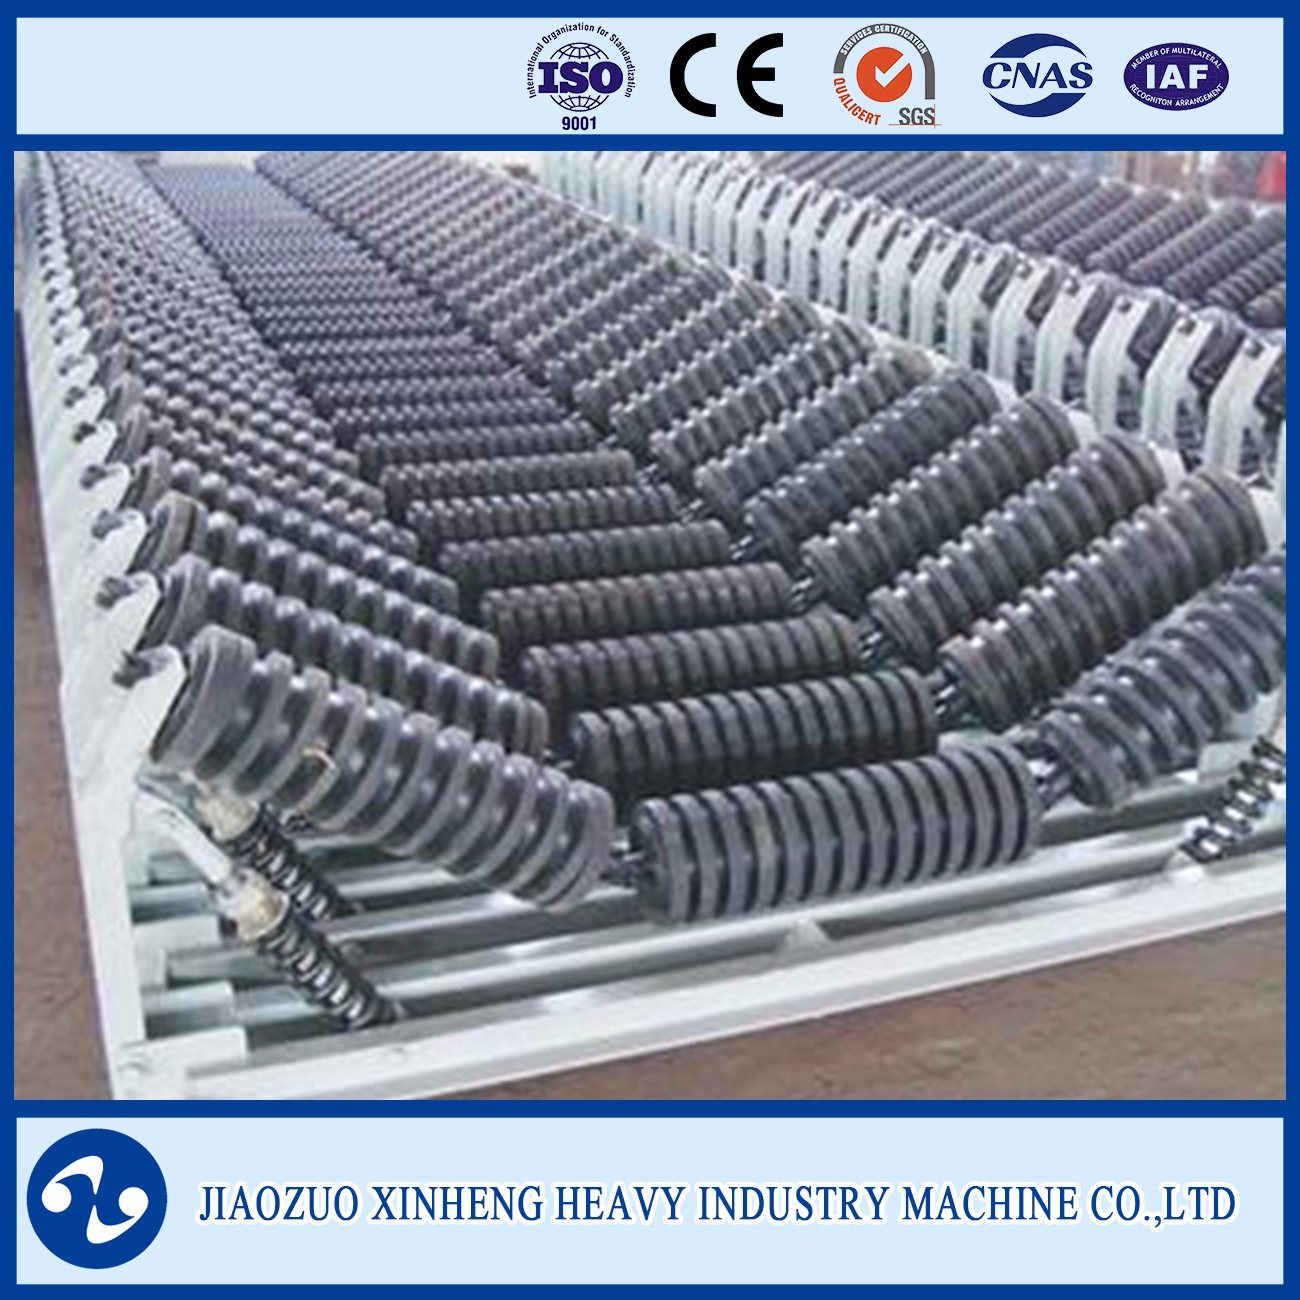 2017 High Quality Conveyor Roller for Belt Conveyor